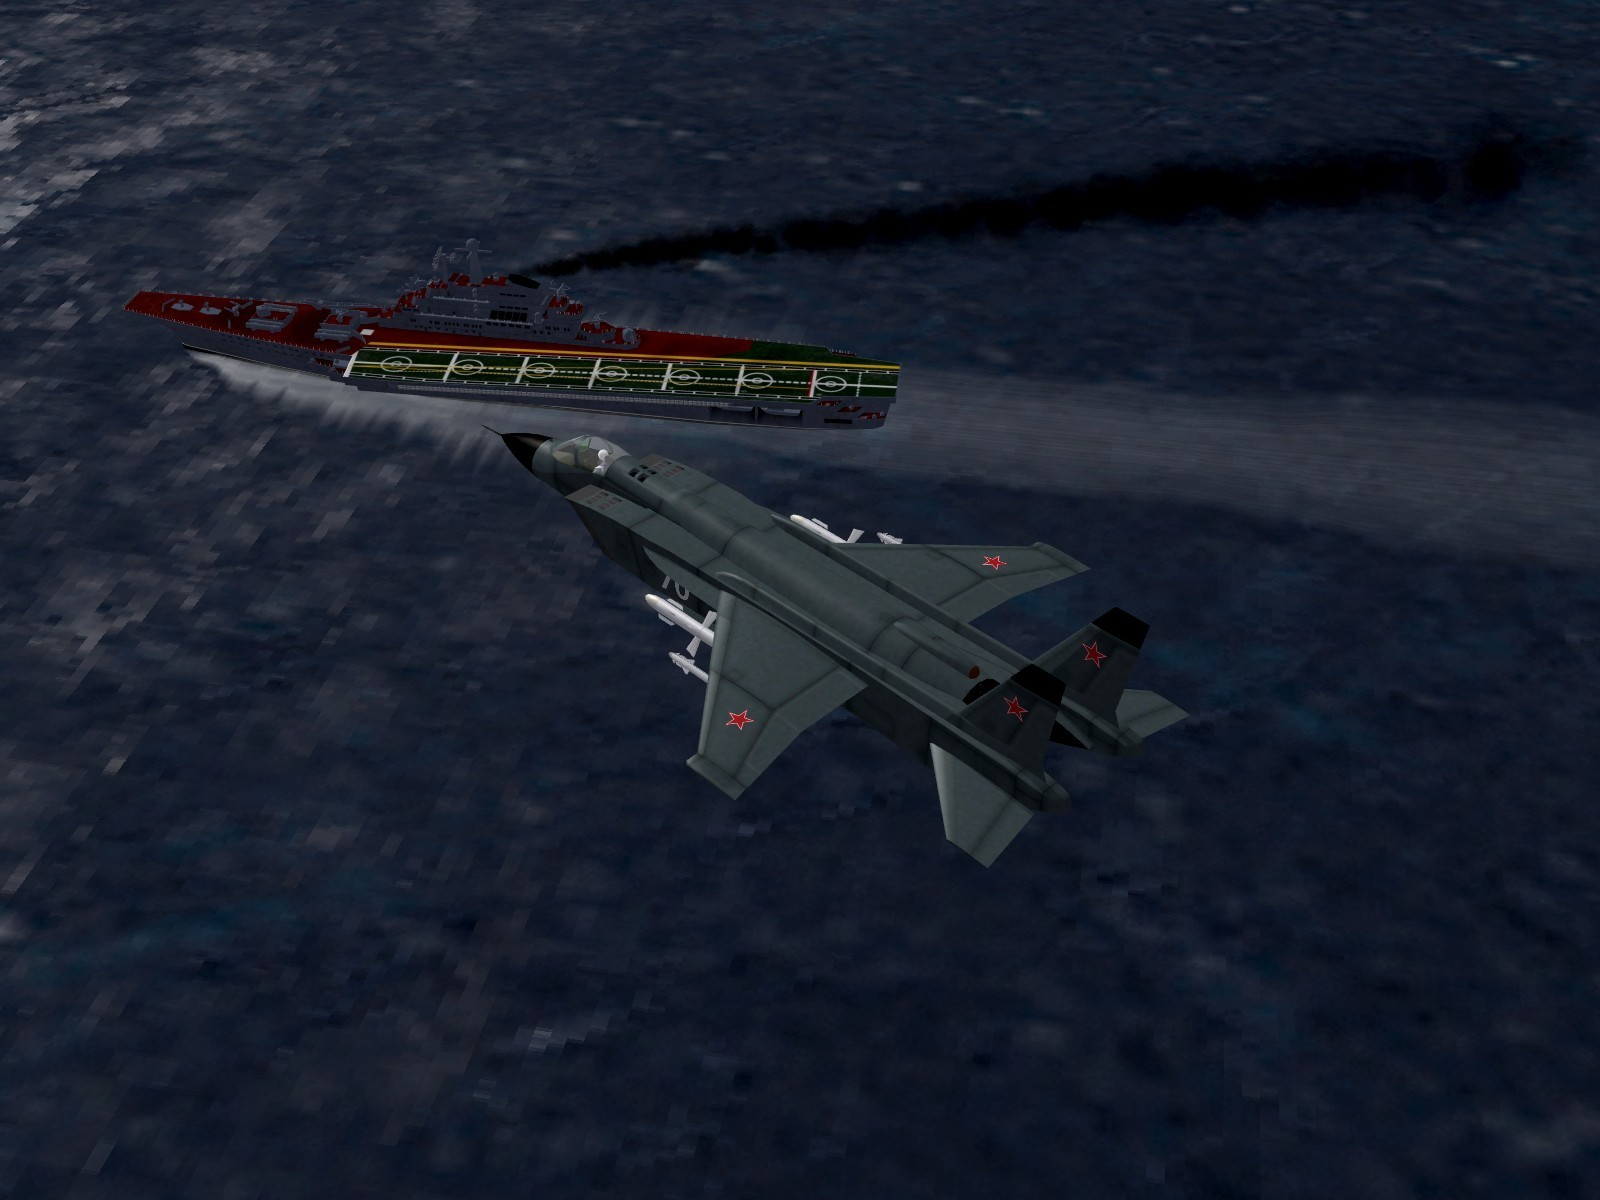 Yak-141M Flying over the Kiev